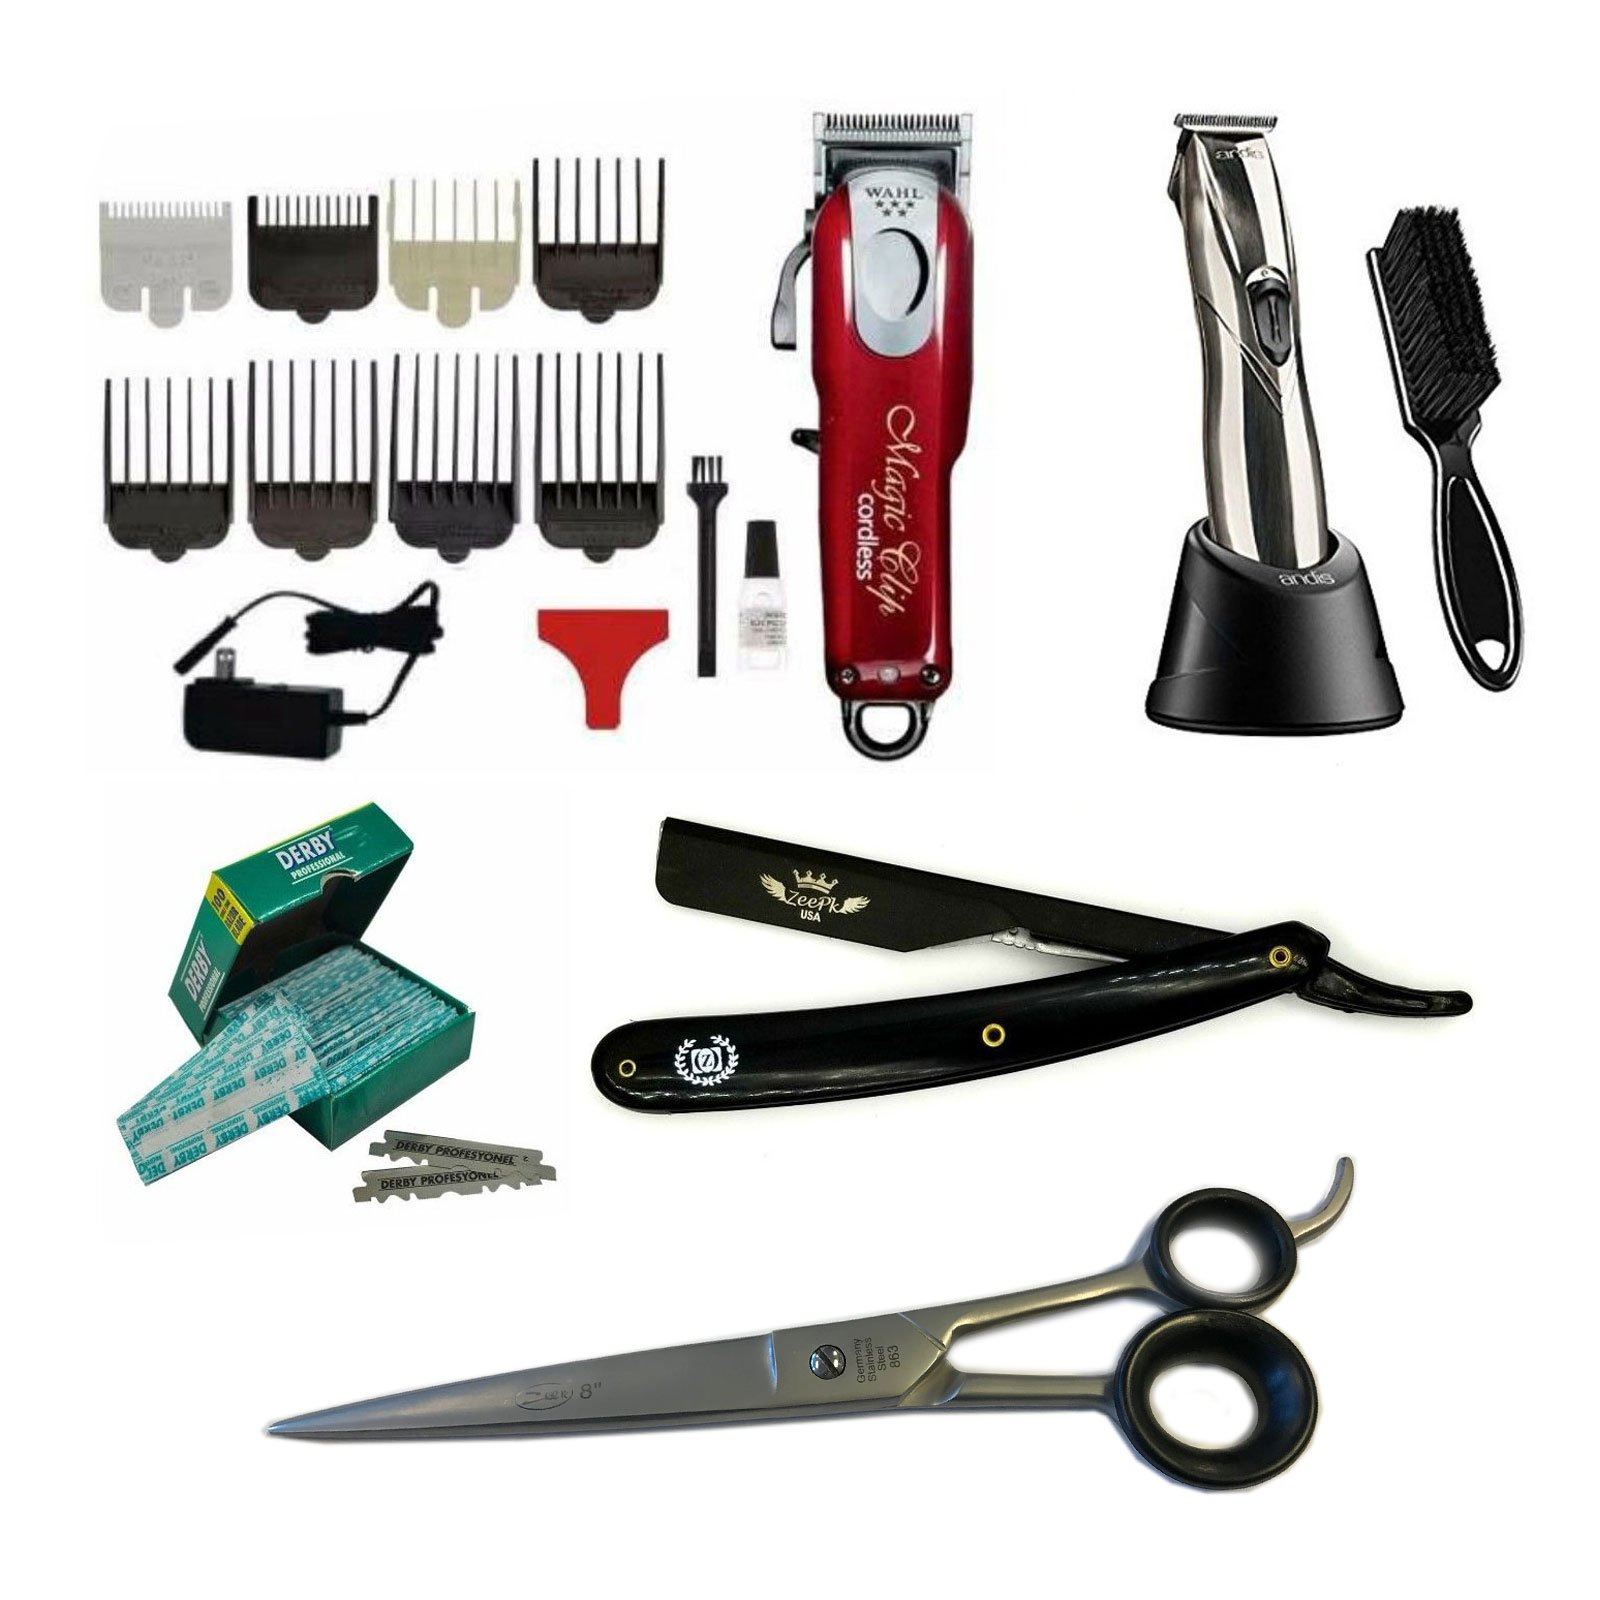 Traveling Barber Kit Cosmetology School Kit / Beauty Professional hairdressing Wahl Cordless Magic Clipper Andis Slimline Pro Li Trimmer Zeepk 8'' Shears Barber Shavette Razor with 100 Derby Blades